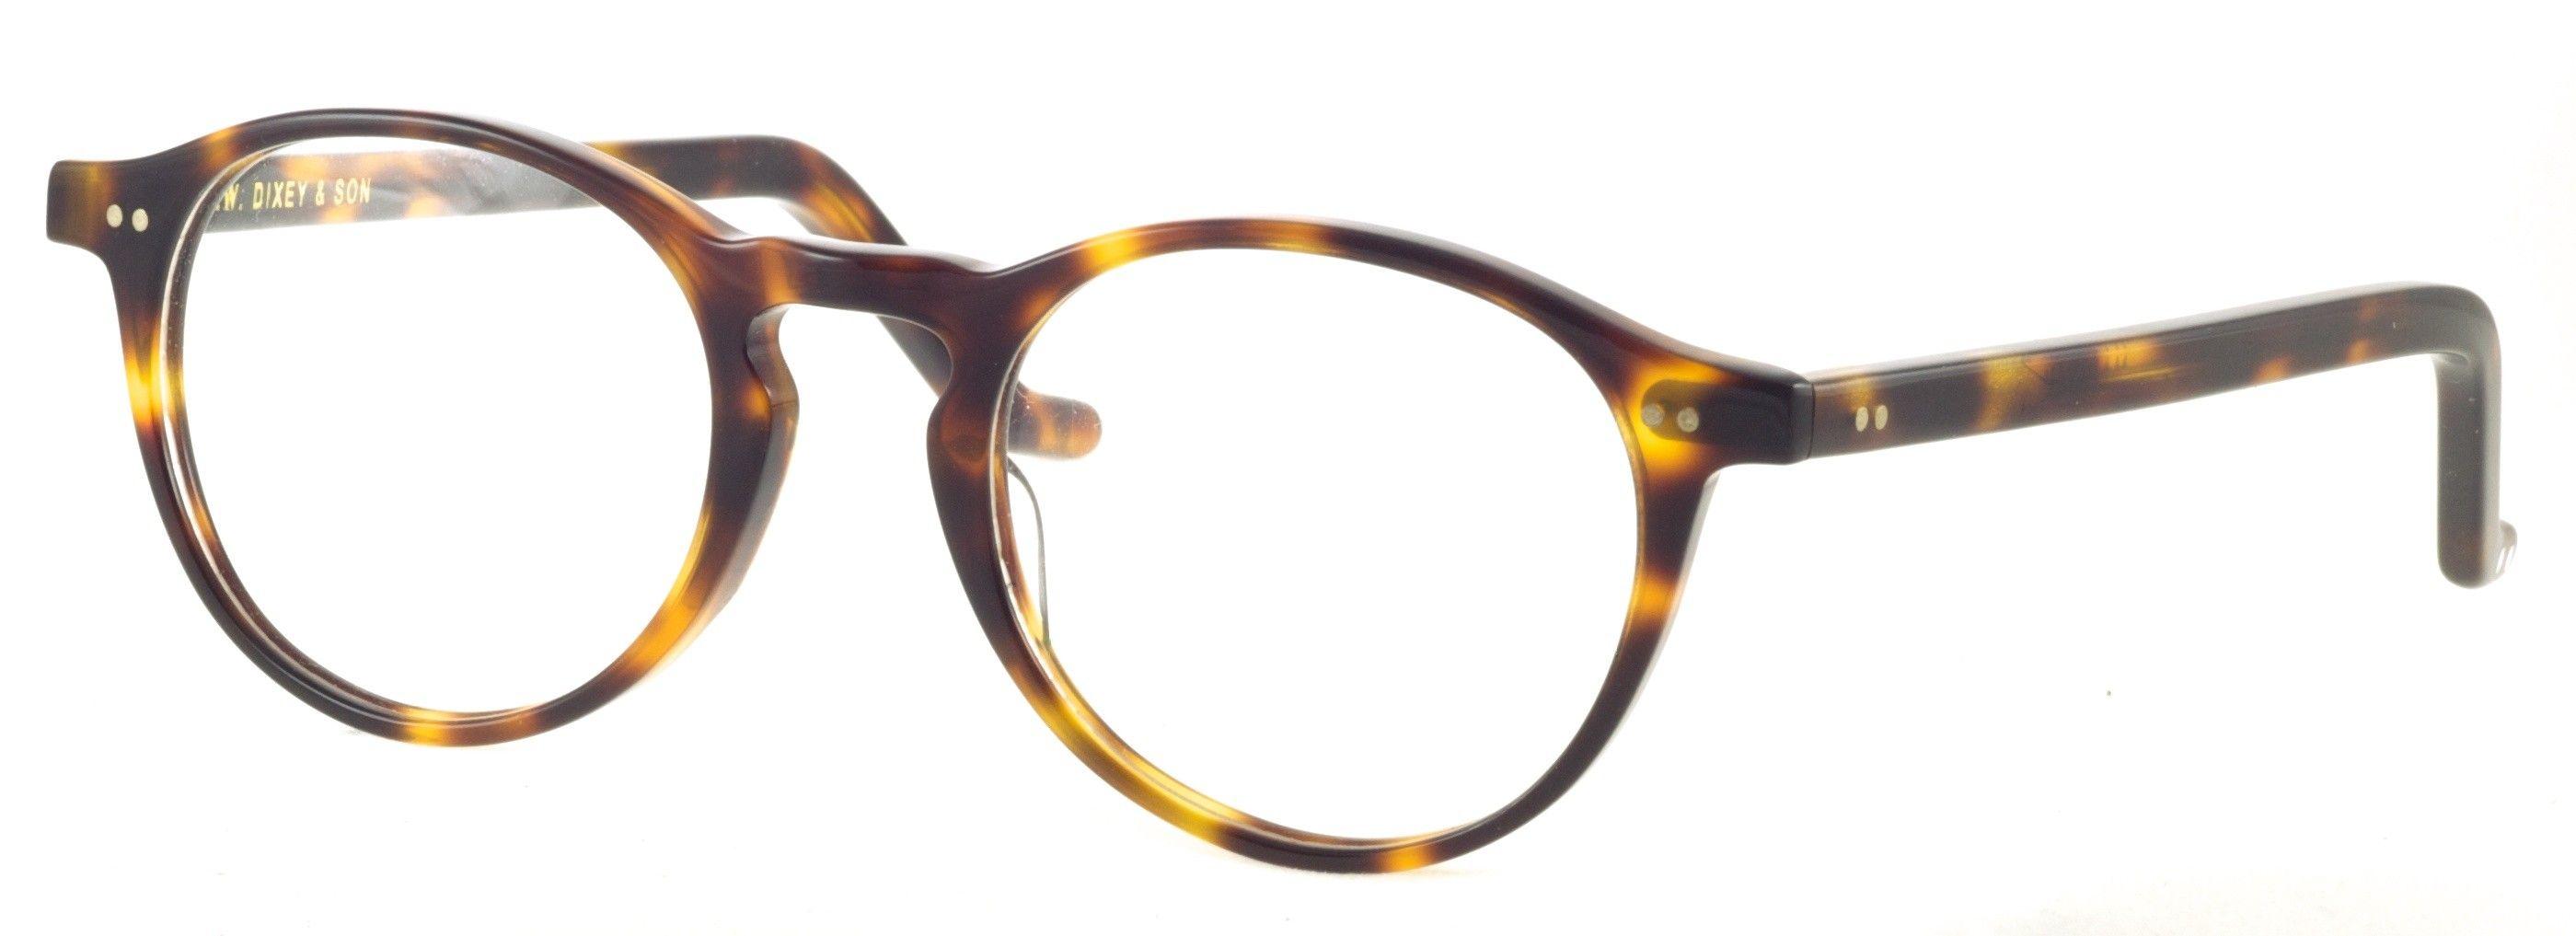 c w dixey son chartwell 03 t tortoiseshell glasses